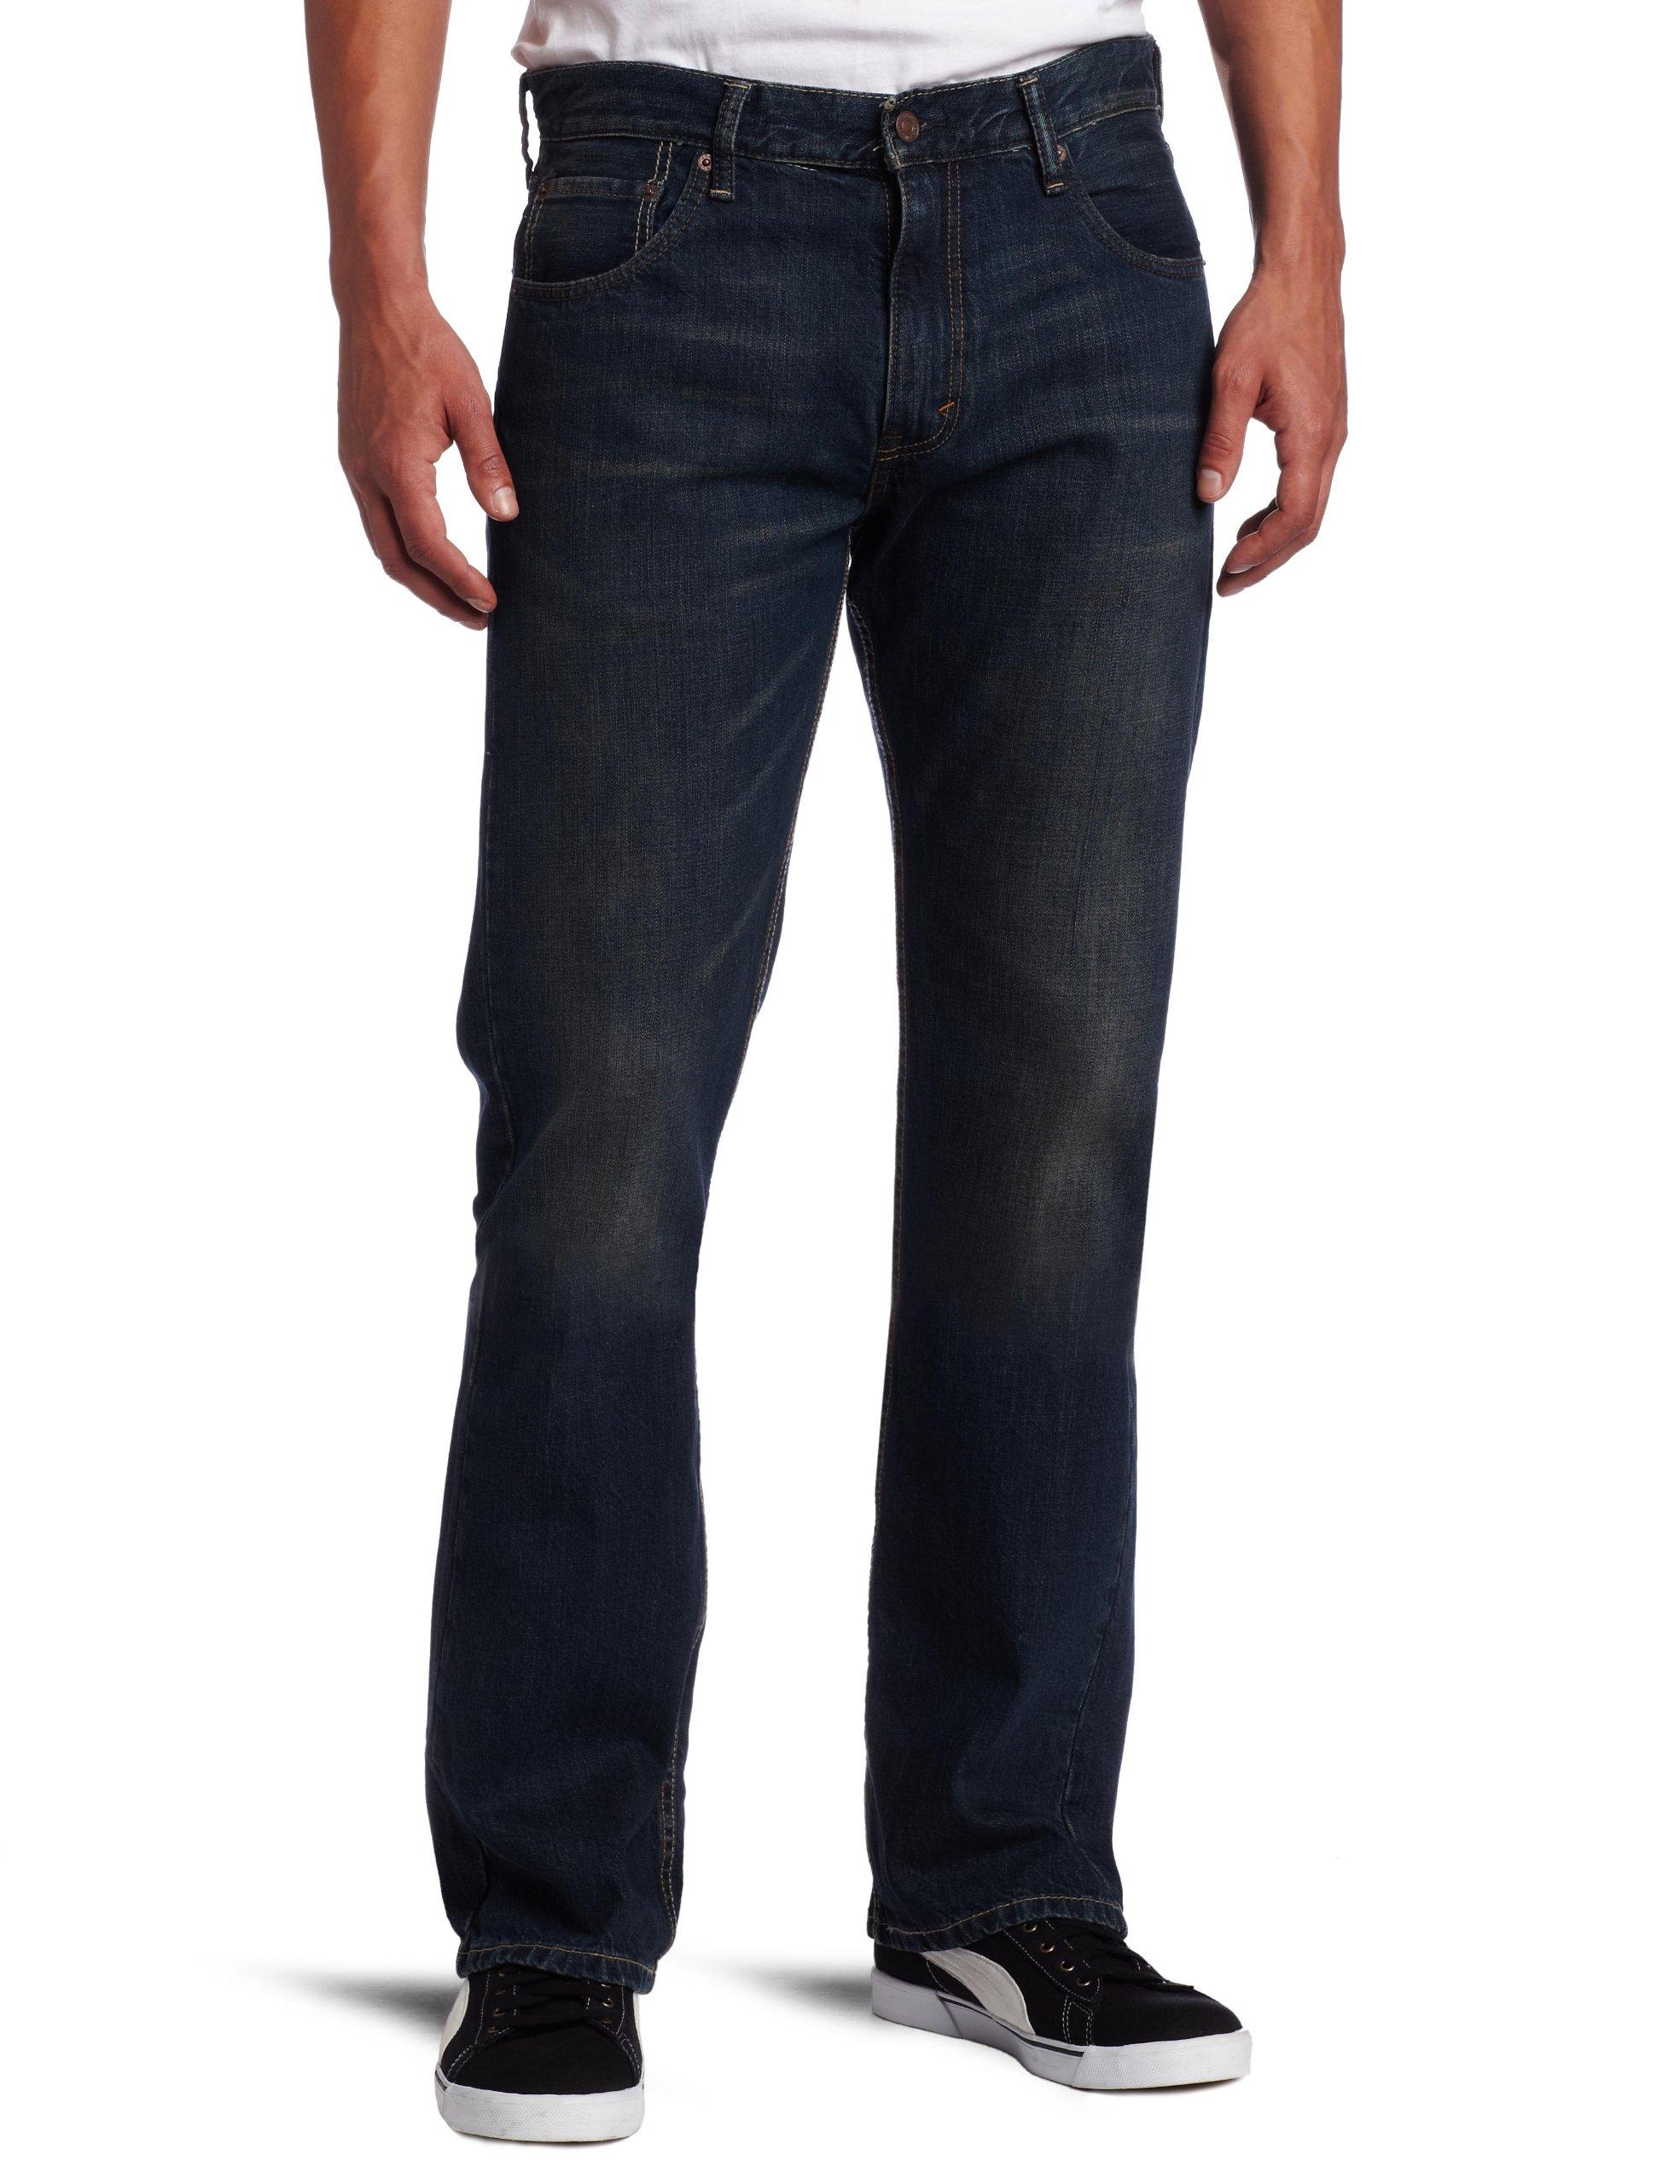 Levi's  Men's 527 Slim Boot Cut Jean, Overhaul, 34x30